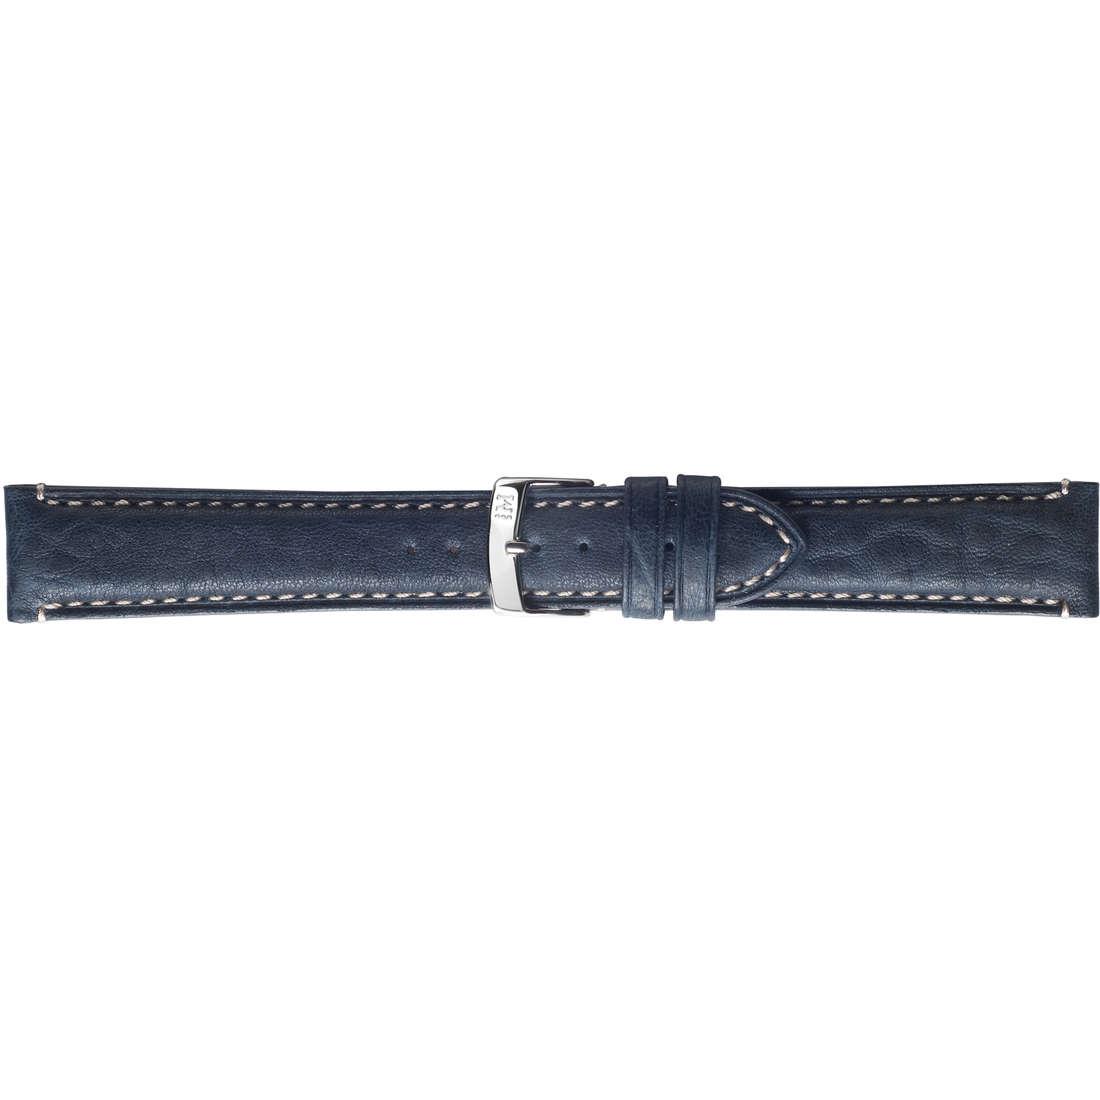 watch watch bands watch straps man Morellato Manufatti A01U4124A81062CR20